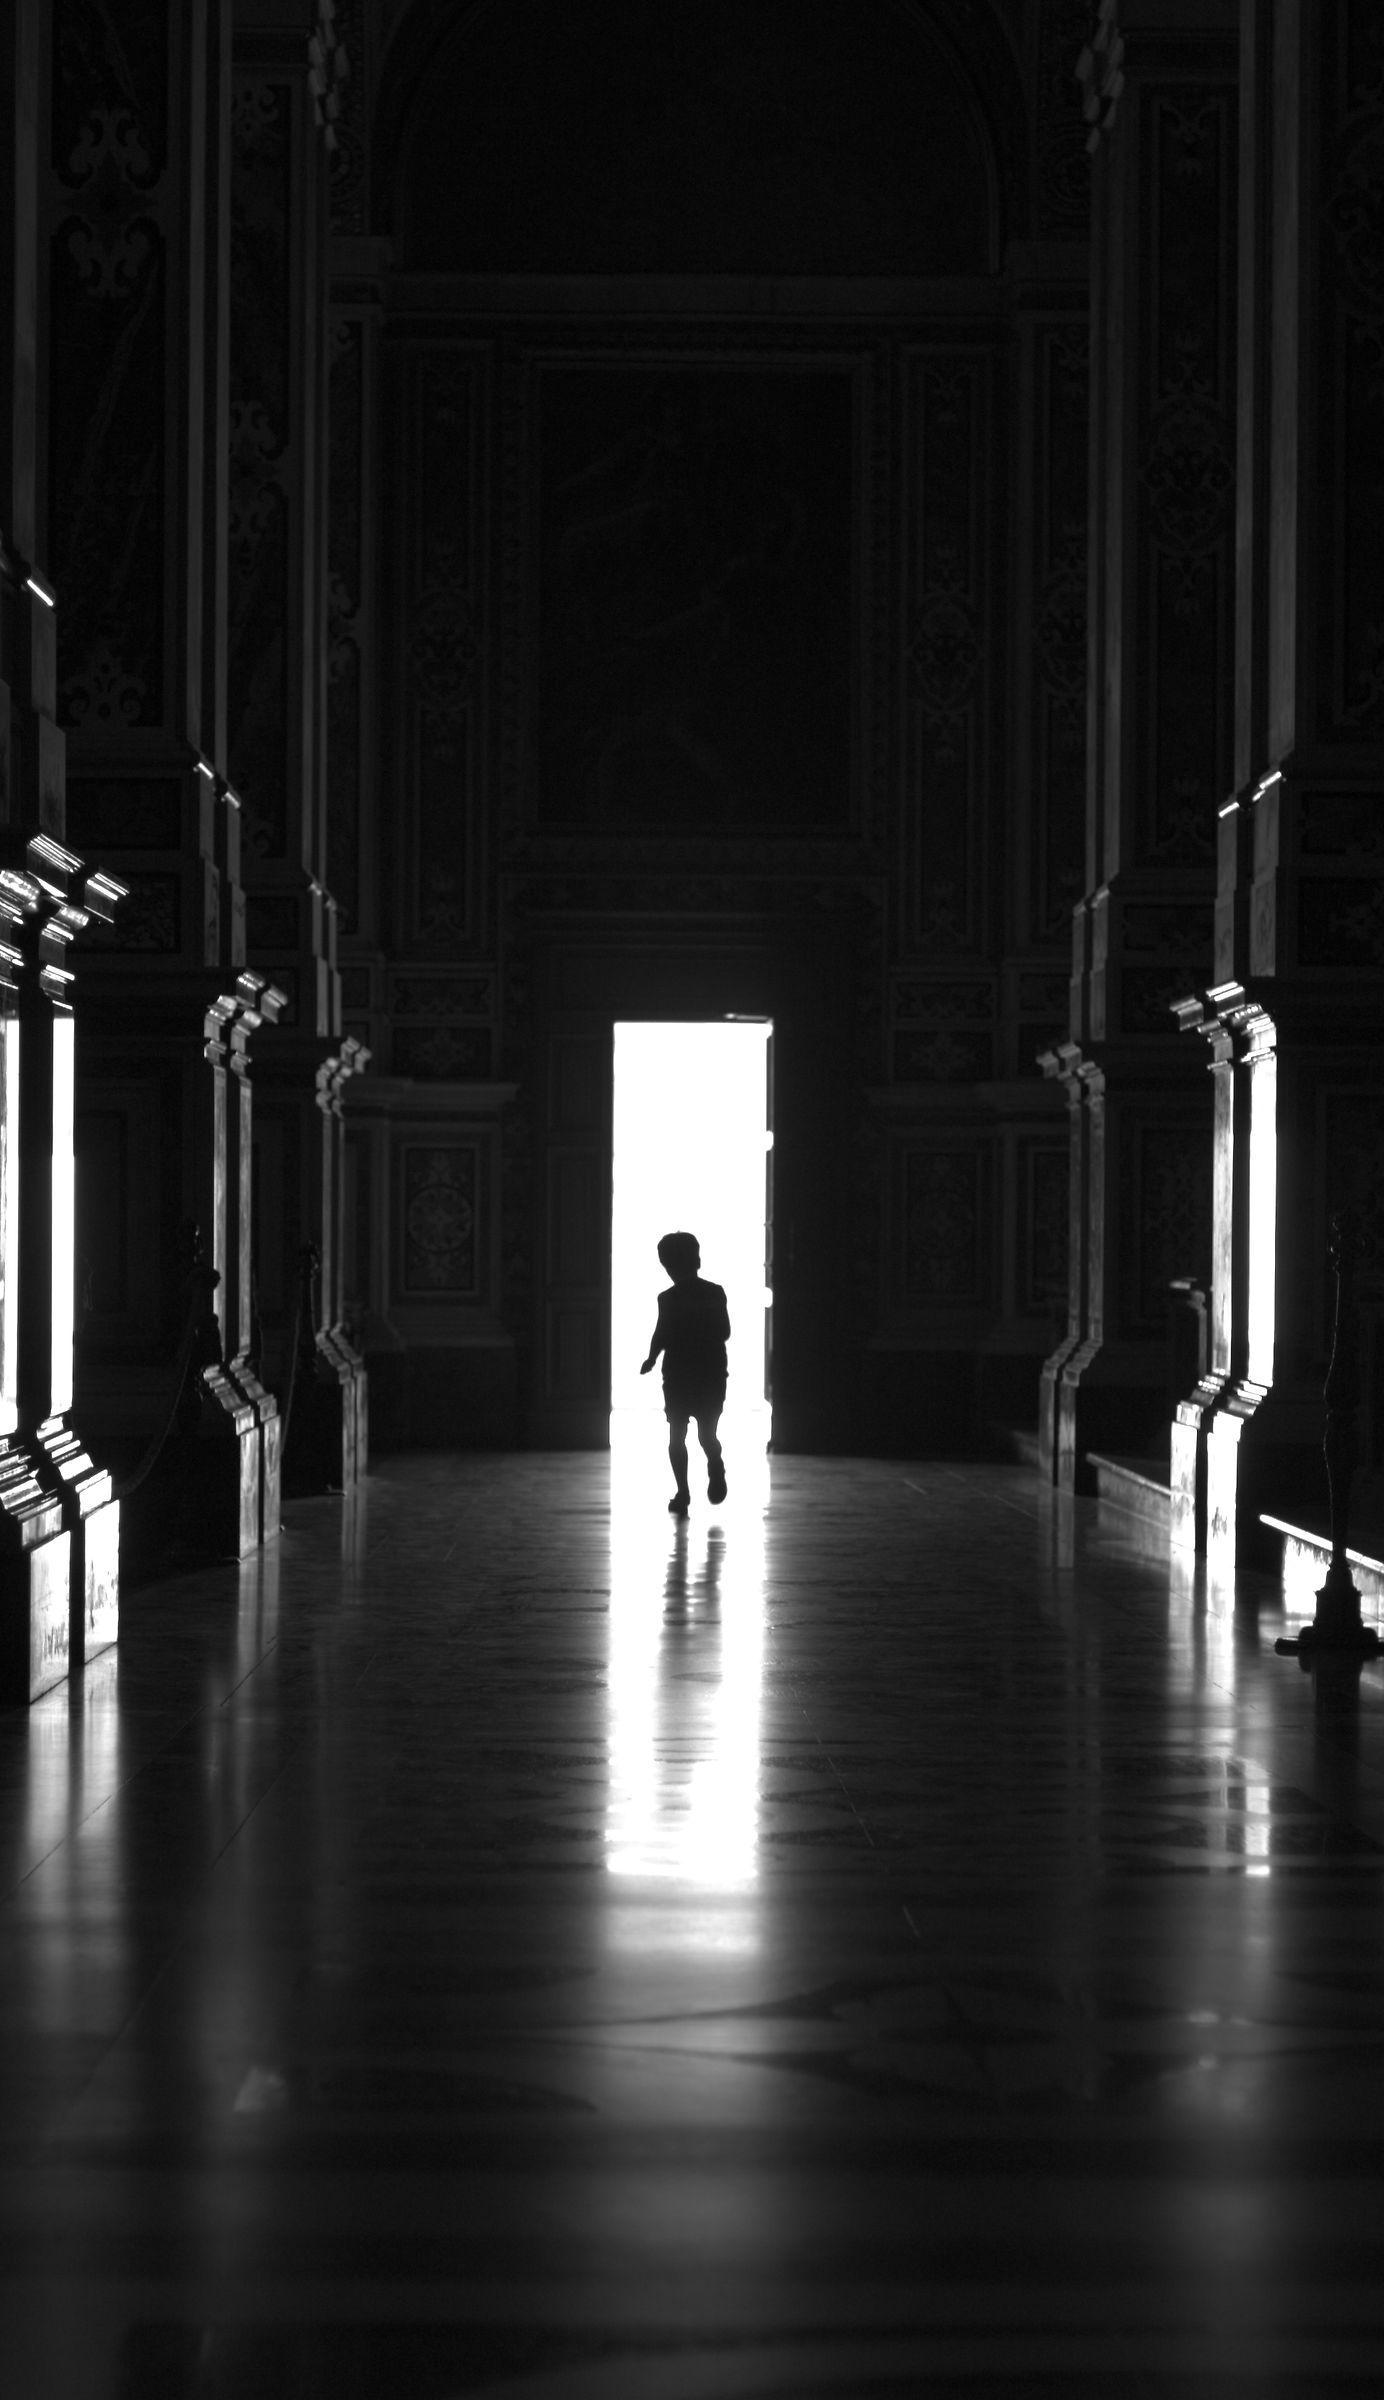 Towards the Light...